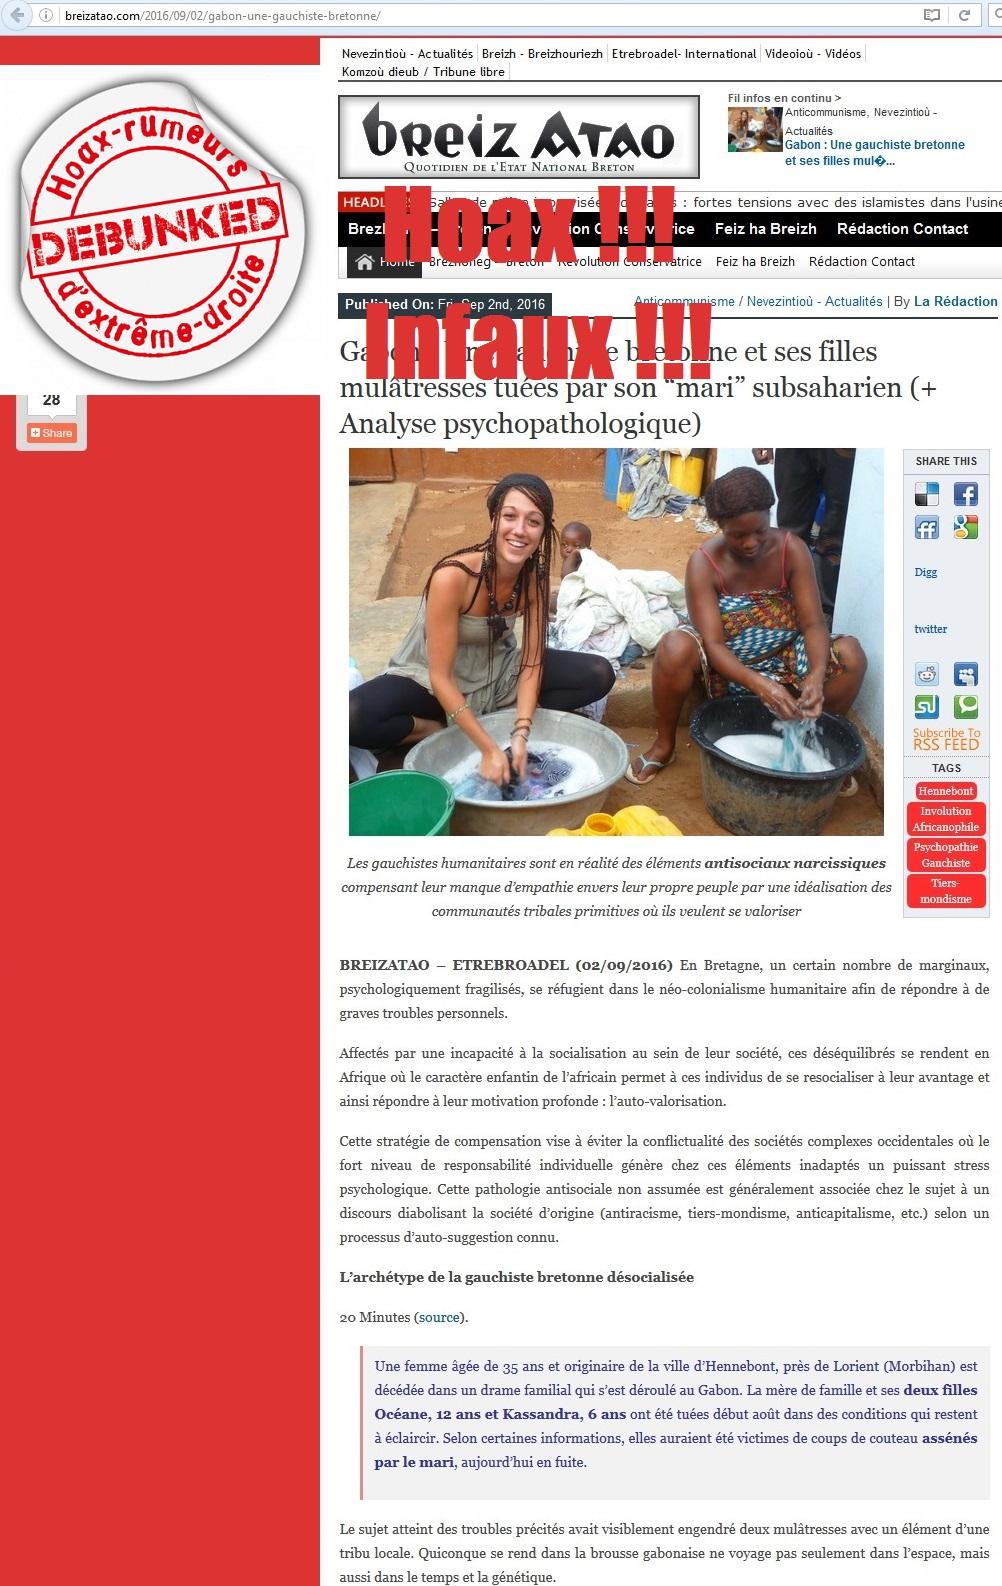 Gabon meurtre braizatao - Copie.jpg